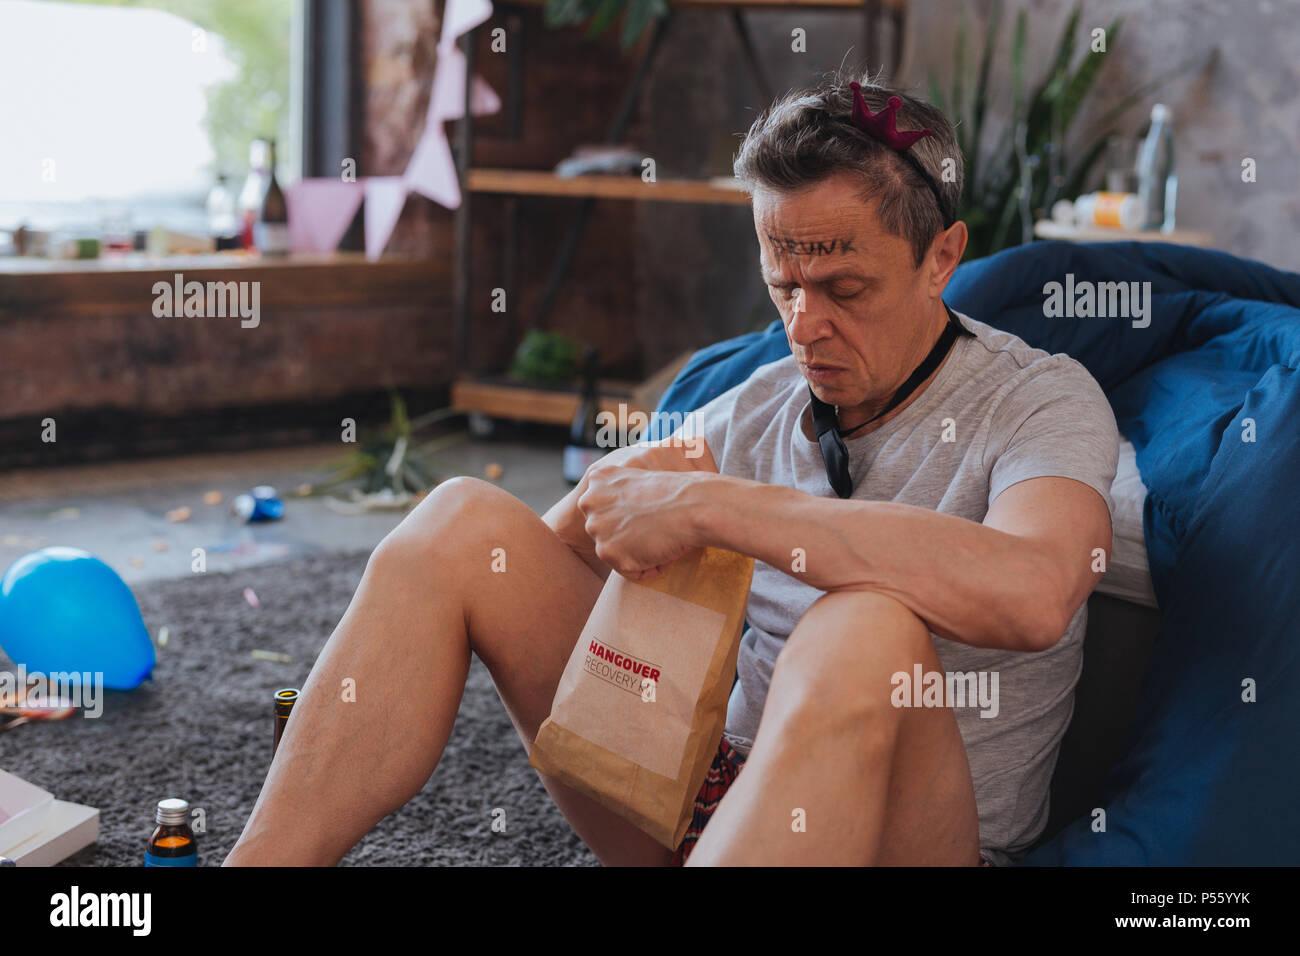 Attentive mature man unpacking recovery kit - Stock Image